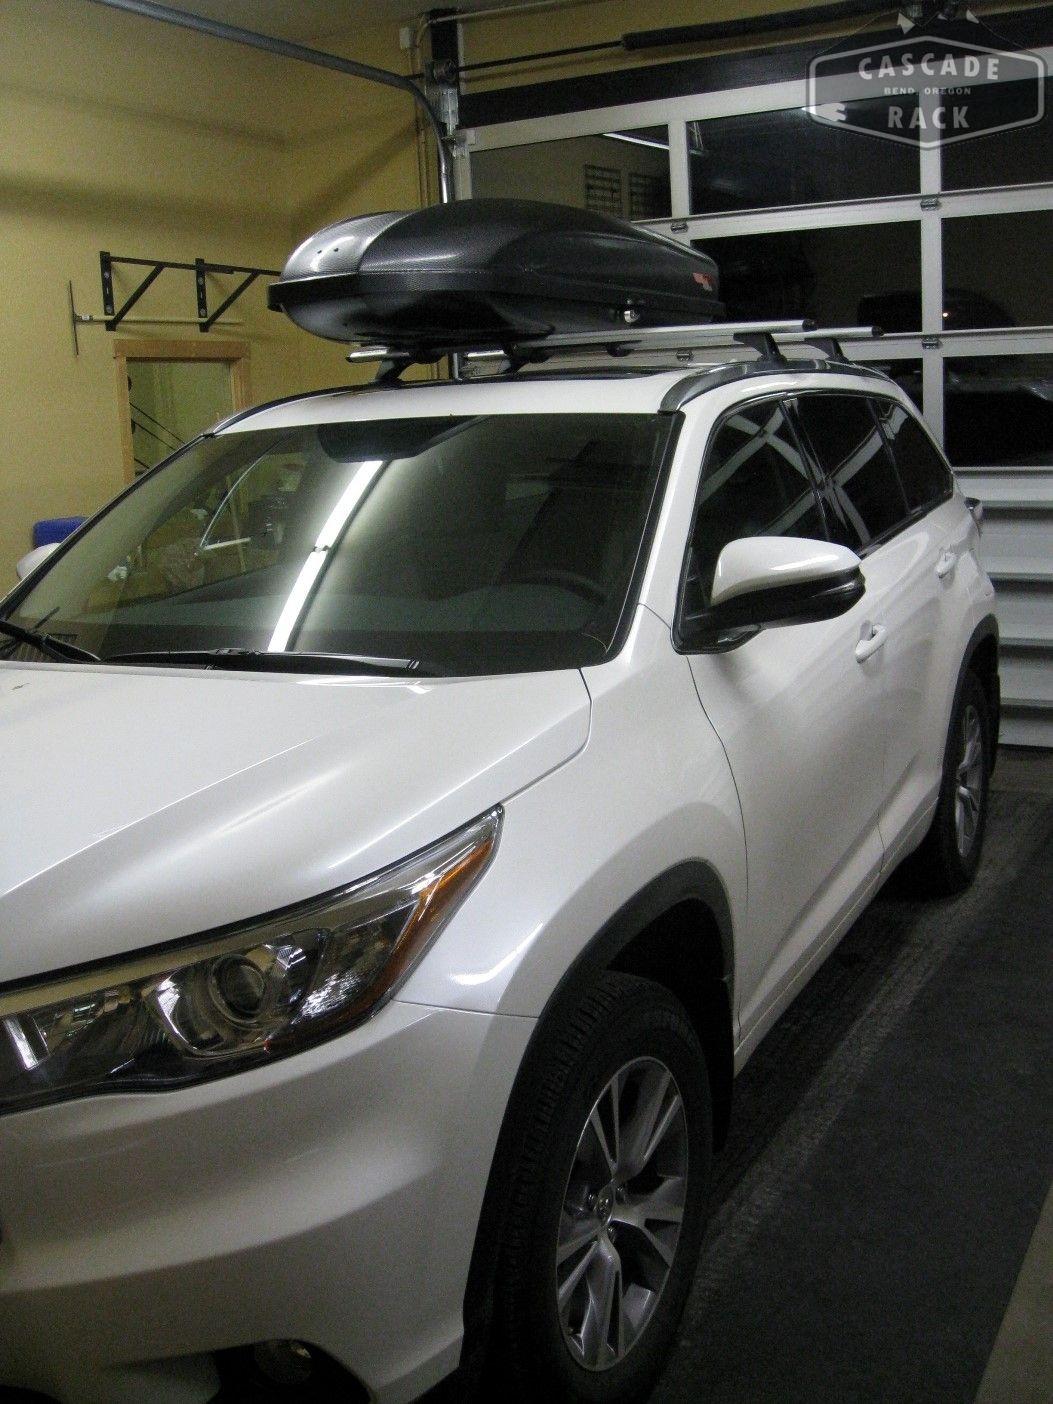 Base Rack And Cargo Box Installation 2015 Toyota Highlander Rhino Rack Yakima Toyota Highlander 2015 Toyota Highlander Yakima